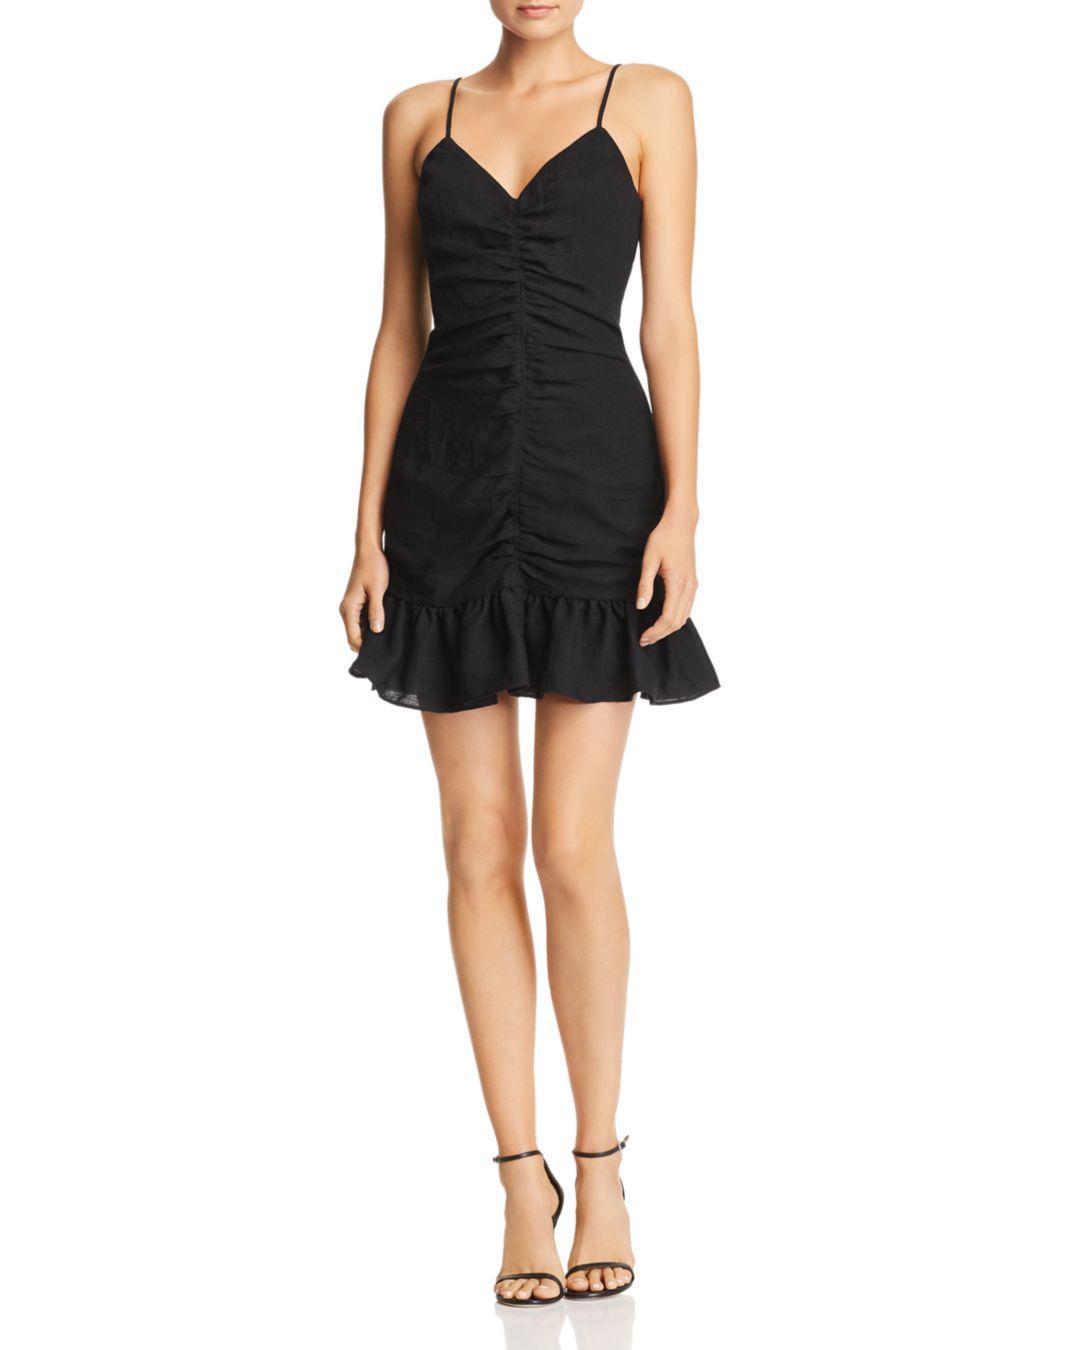 5b9a34ae8d7 The East Order Celine Ruched Ruffled Mini Dress in Black - Lyst